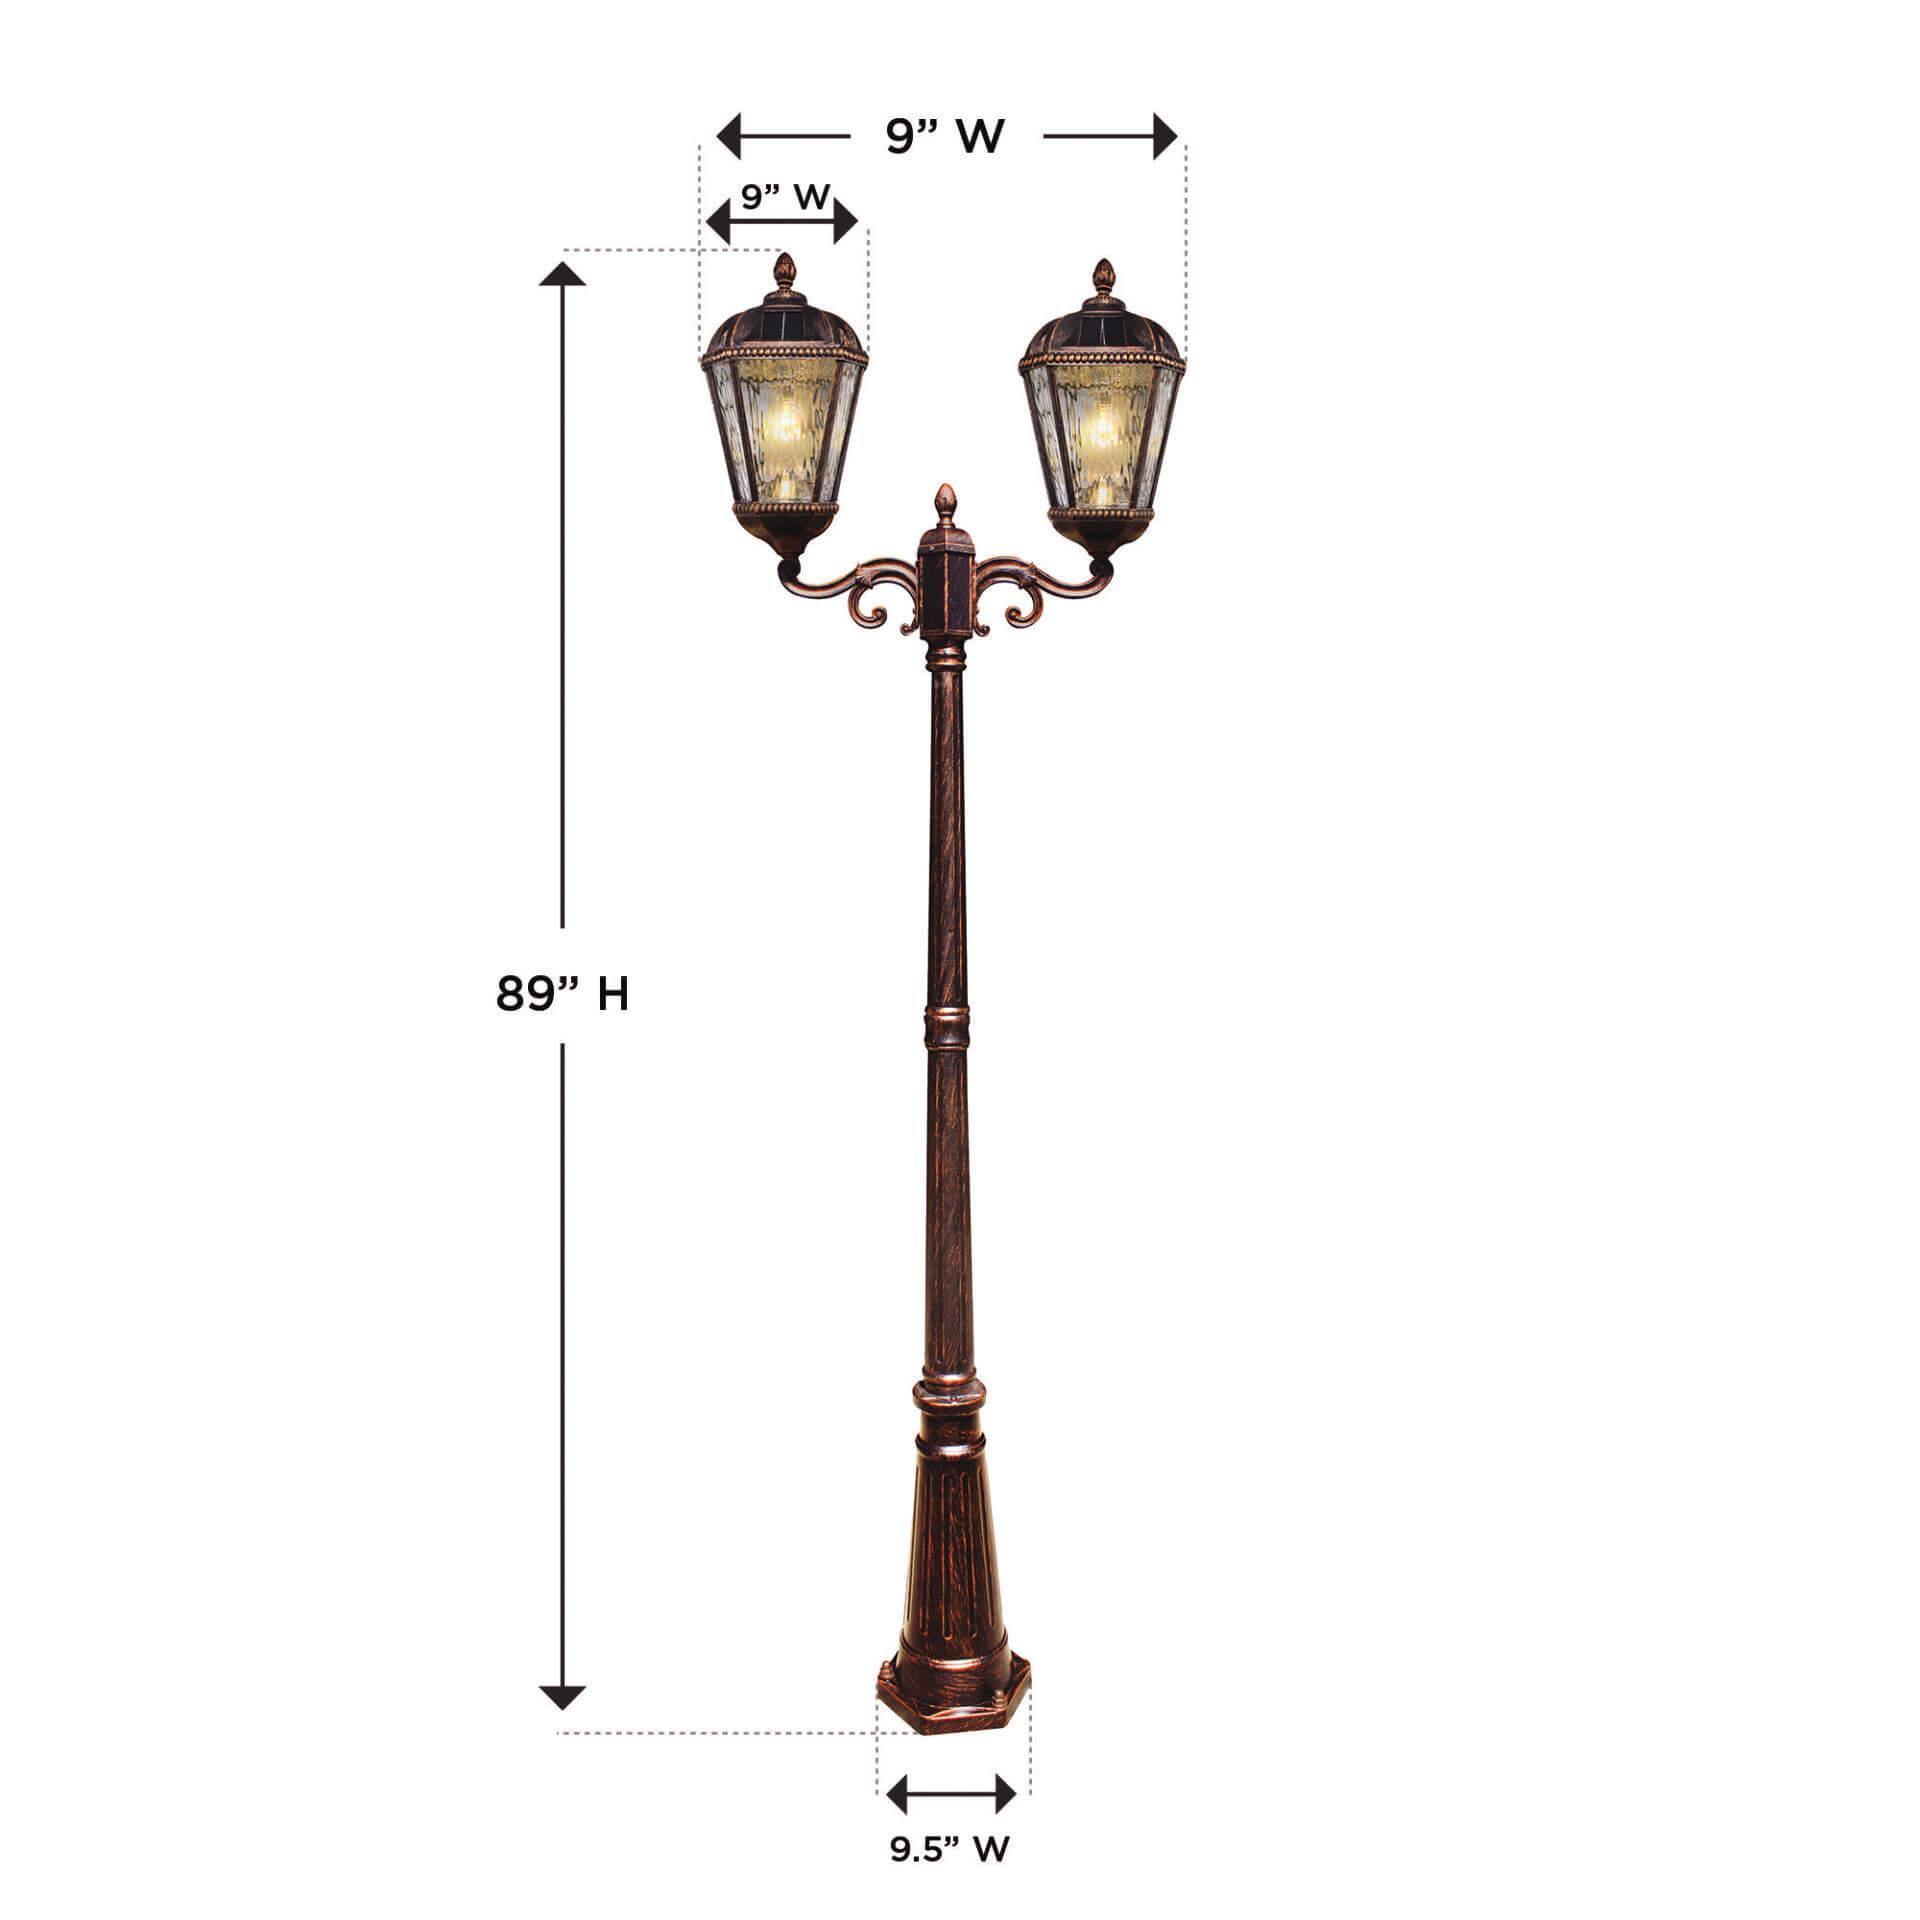 Royal Bulb Double Solar Lamp Dimensions